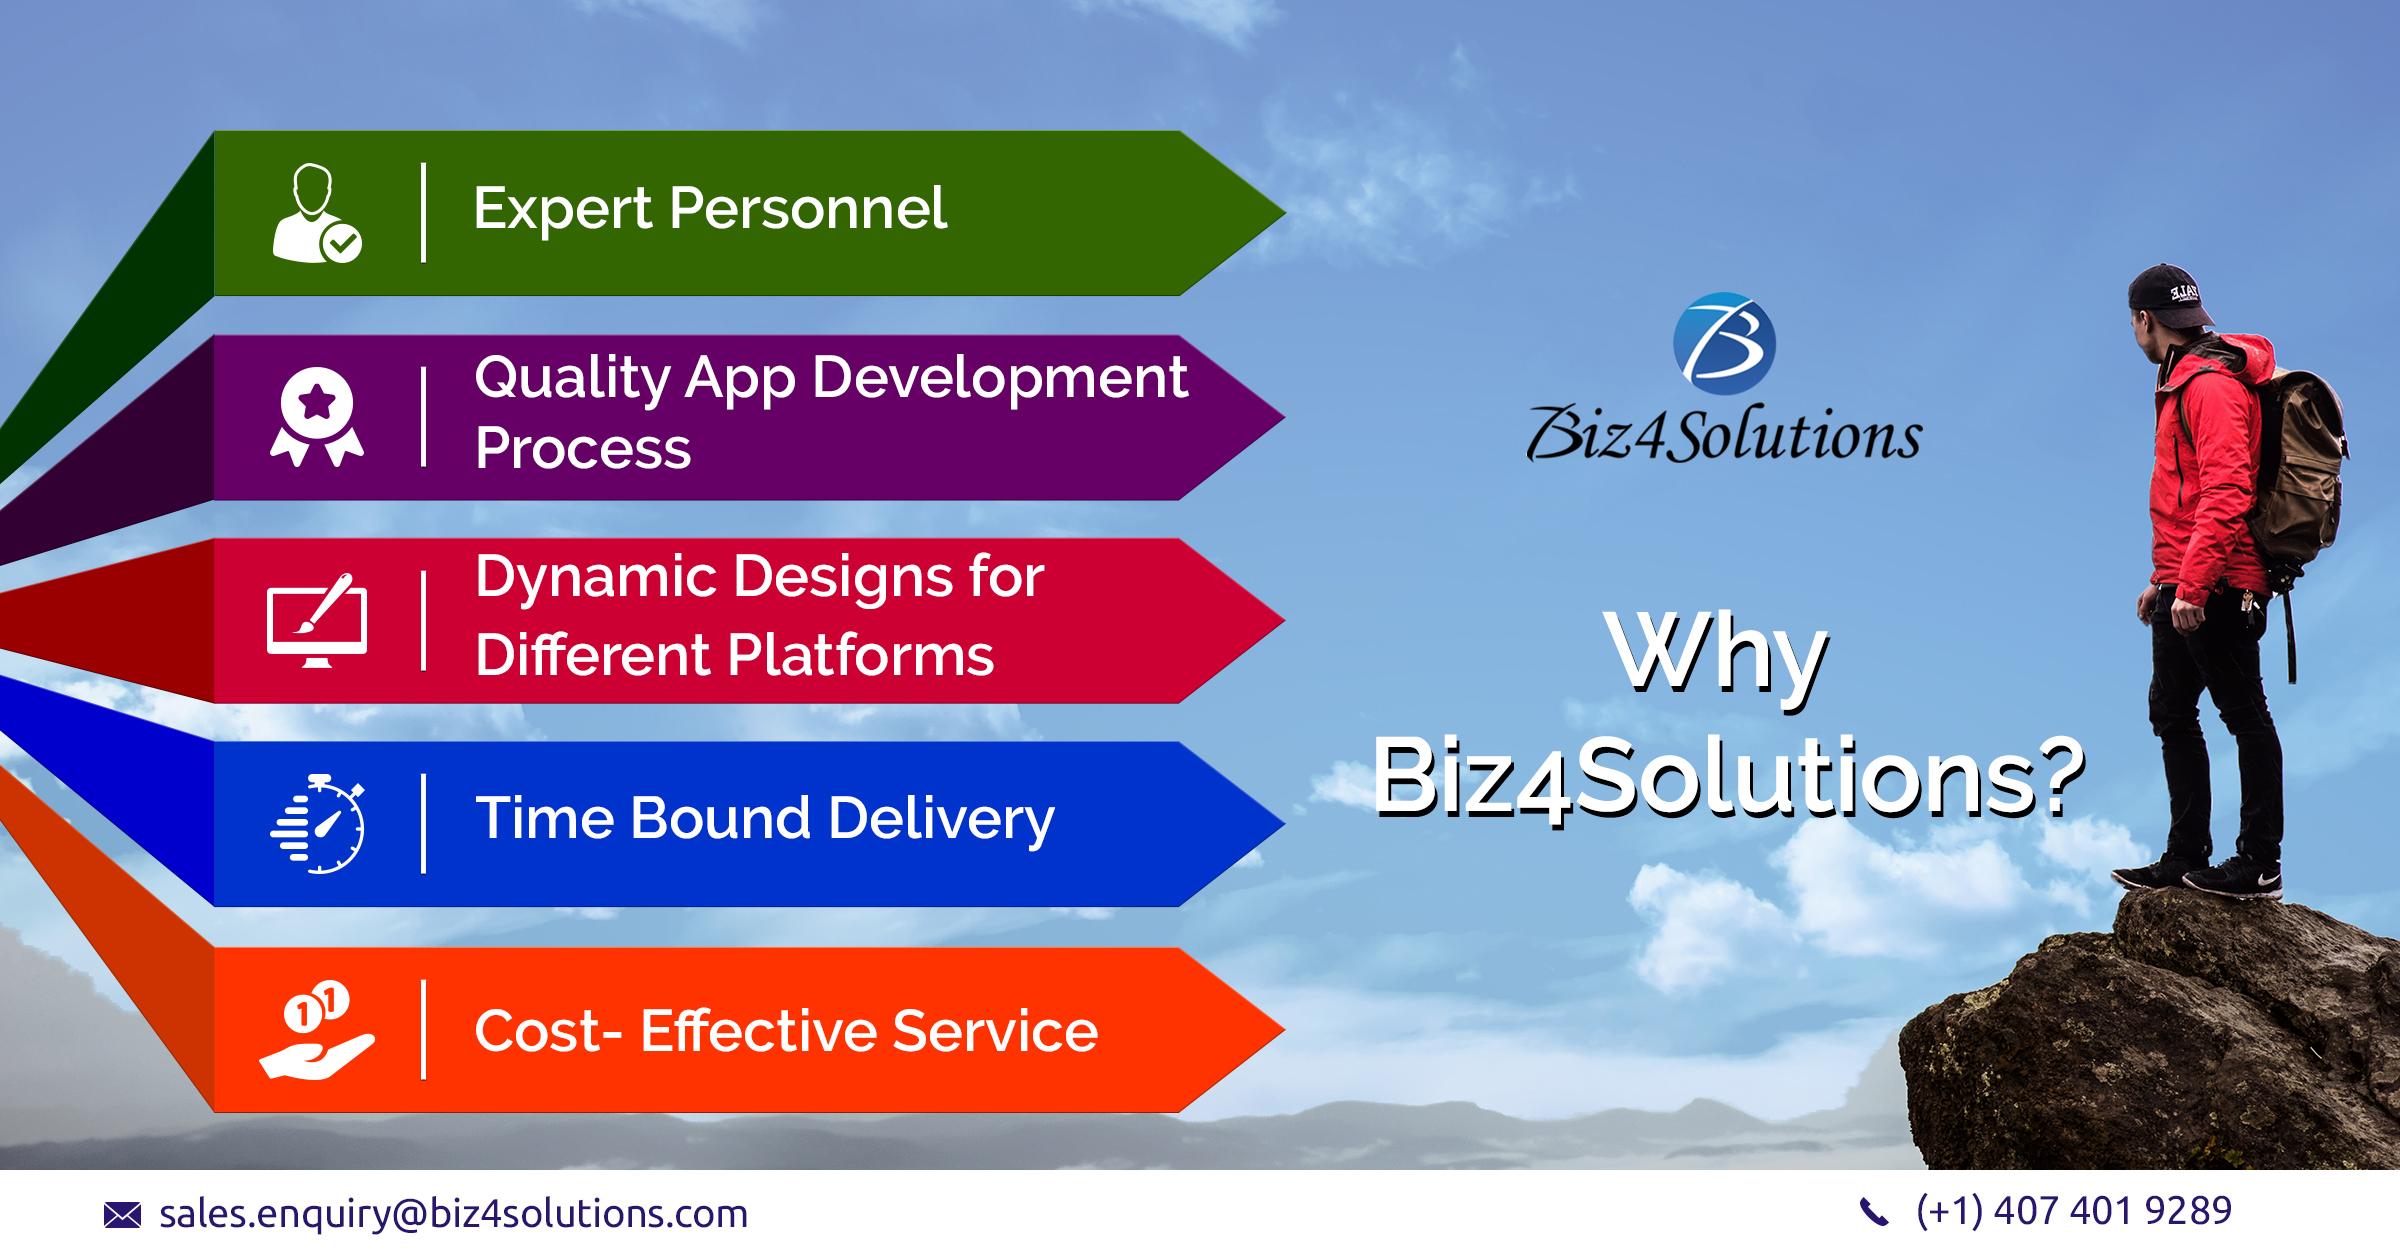 why biz4solutions